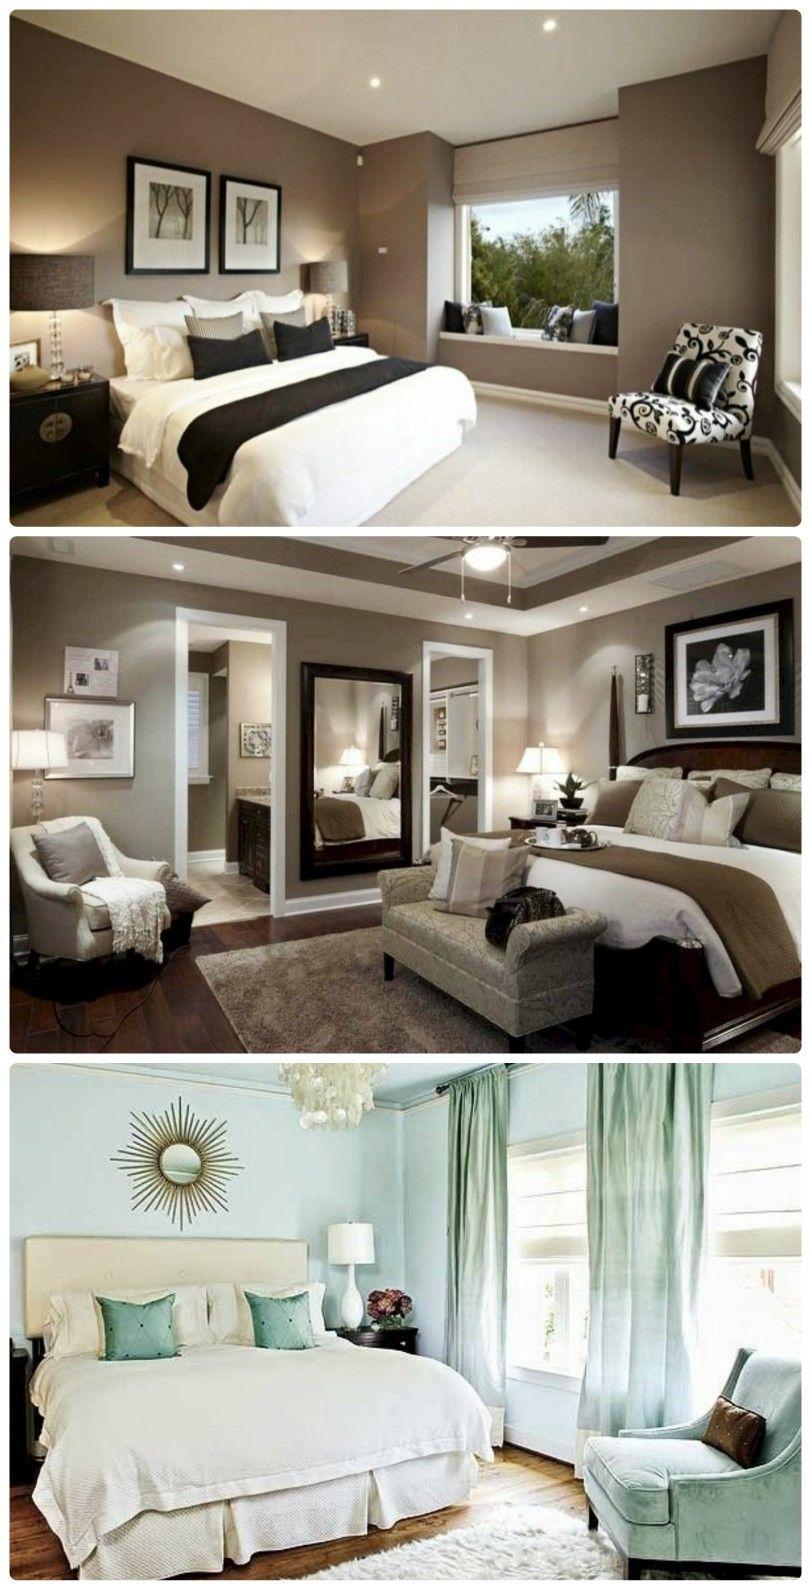 best bedroom decor design ideas for couples man u girls in